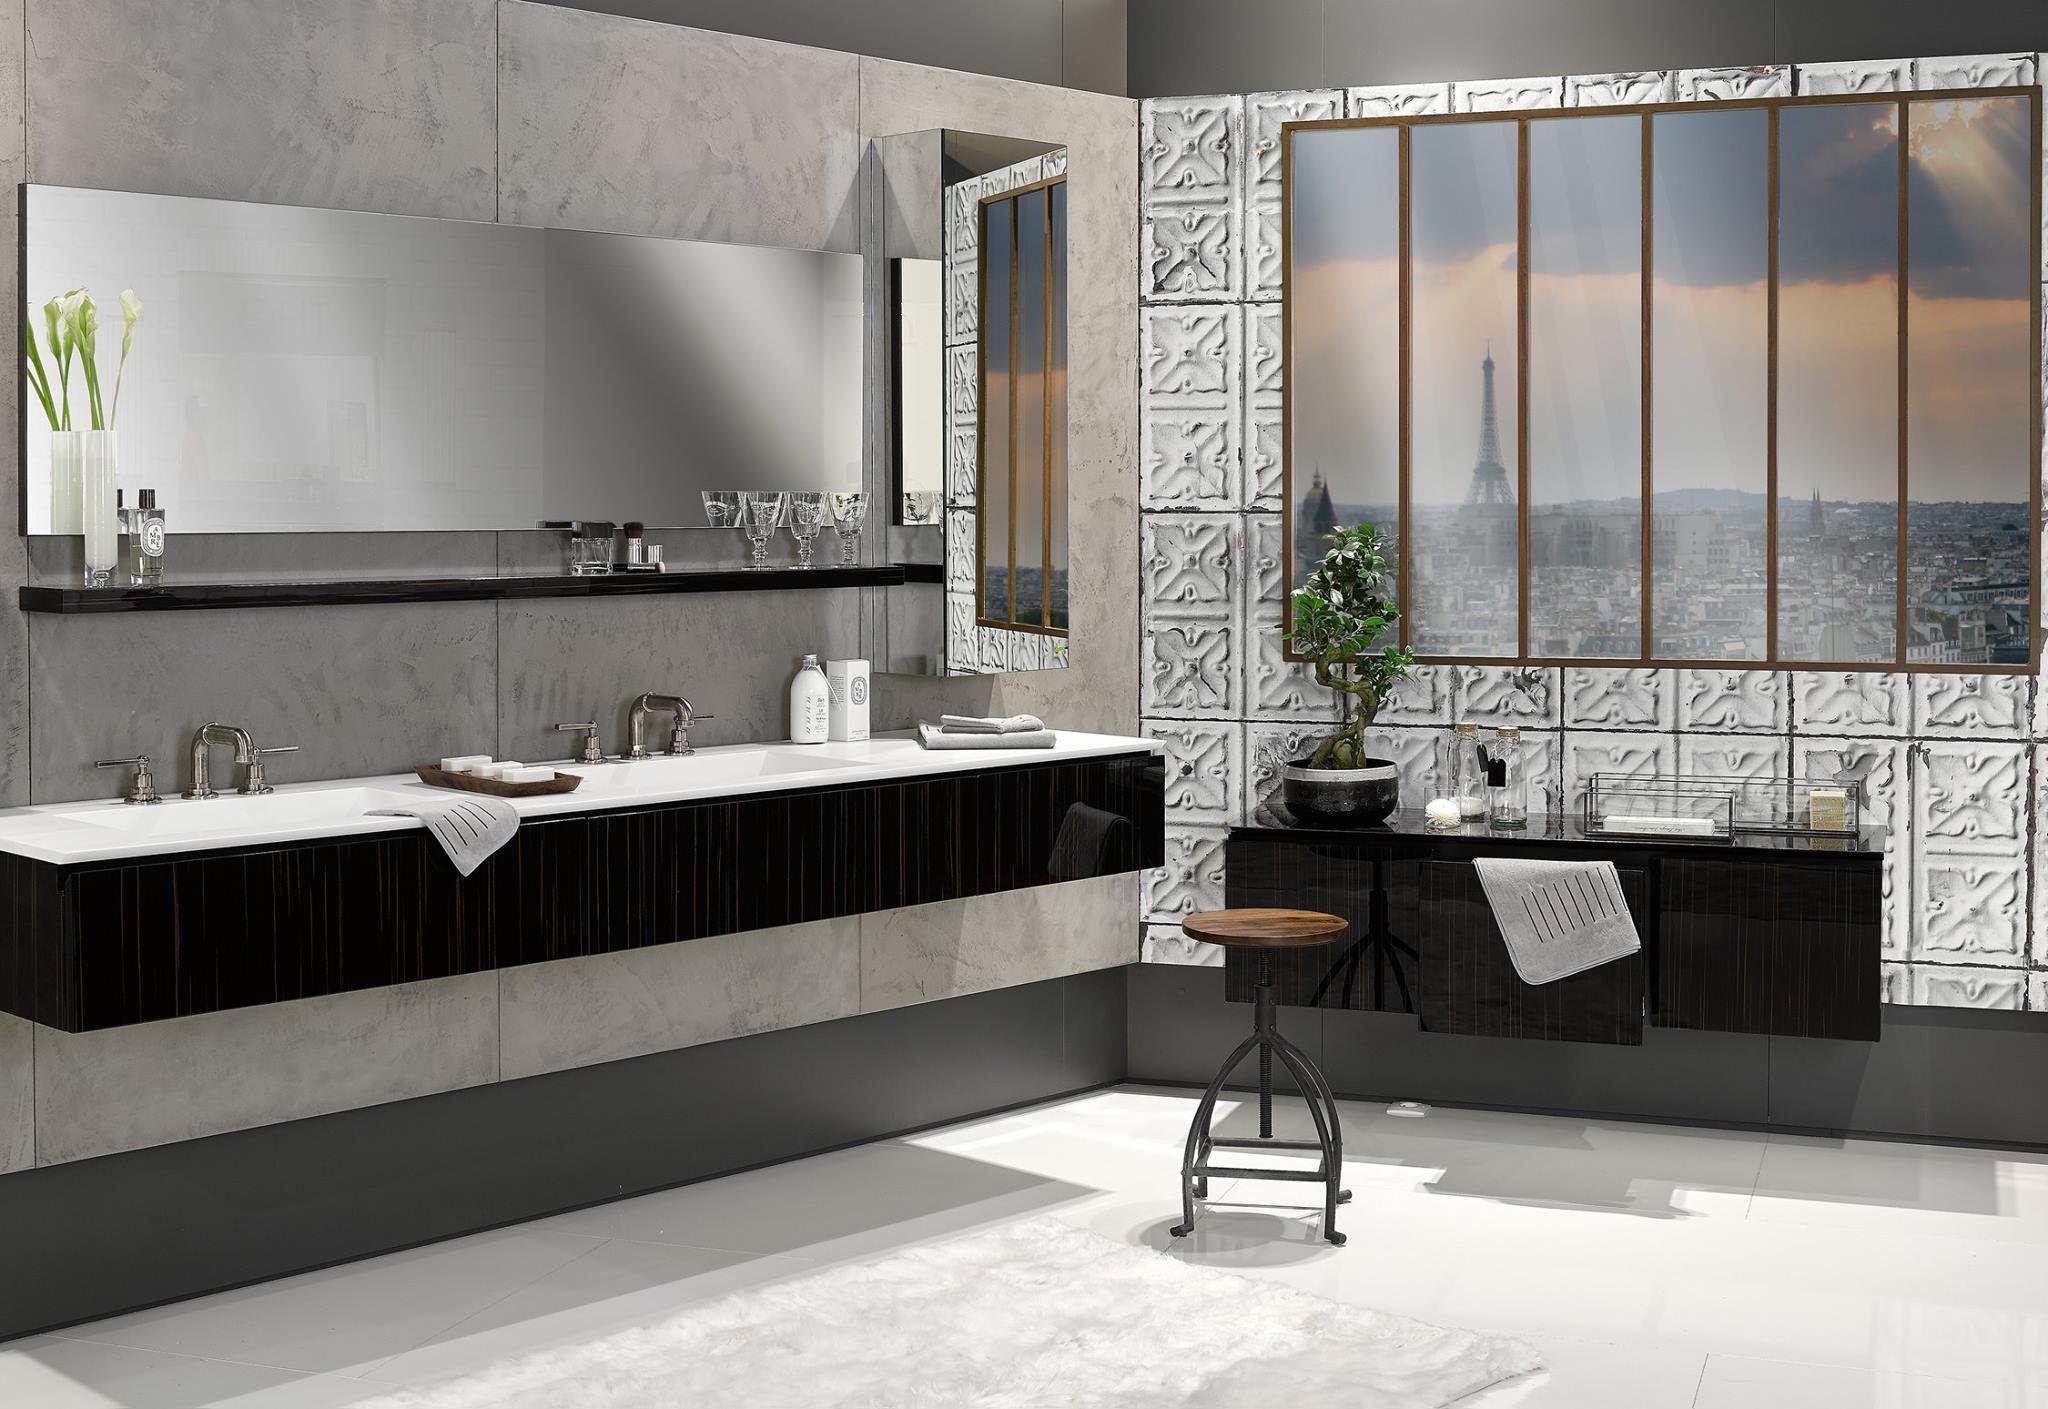 Salle De Bains Au Style Industriel Industrial Bathroom Loft Style